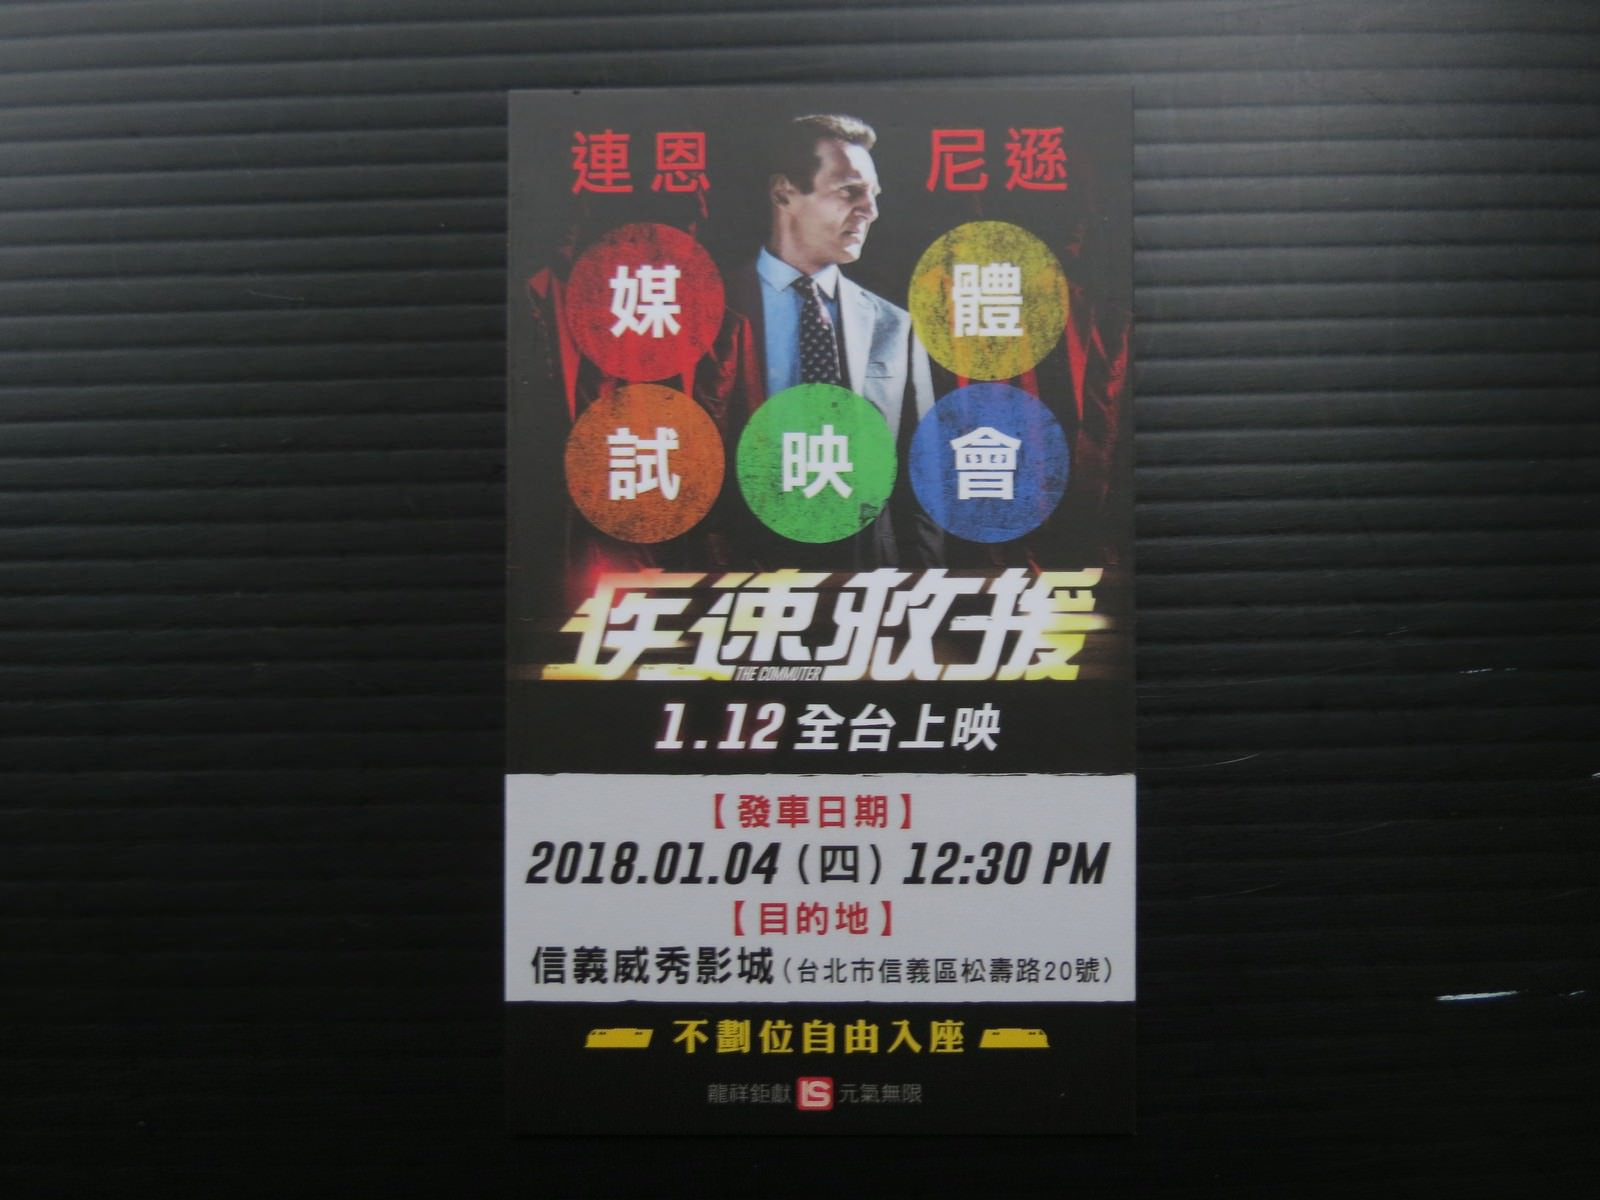 Movie, The Commuter(美國, 2018) / 疾速救援(台灣) / 通勤营救(中國) / 追命列車(香港), 特映特殊票